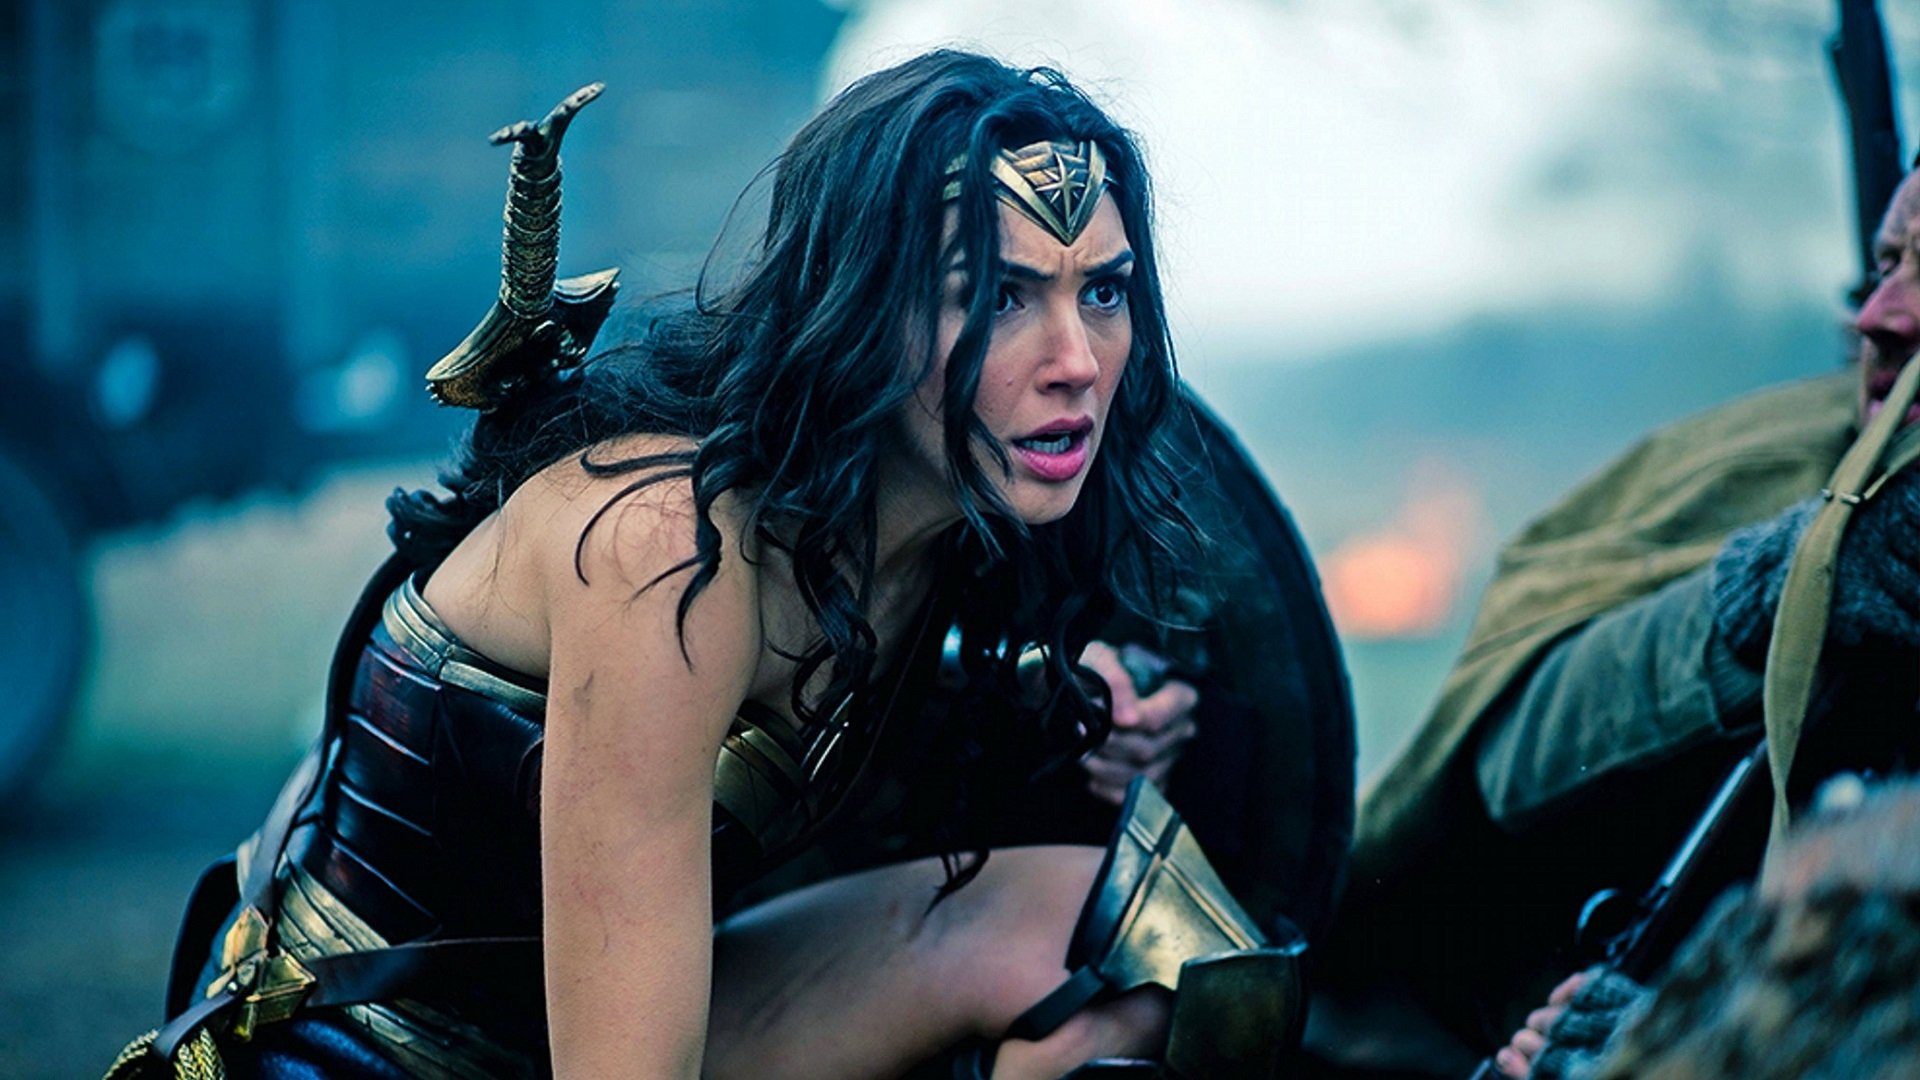 Wallpaper Gal Gadot Wonder Woman Hd Movies 7553